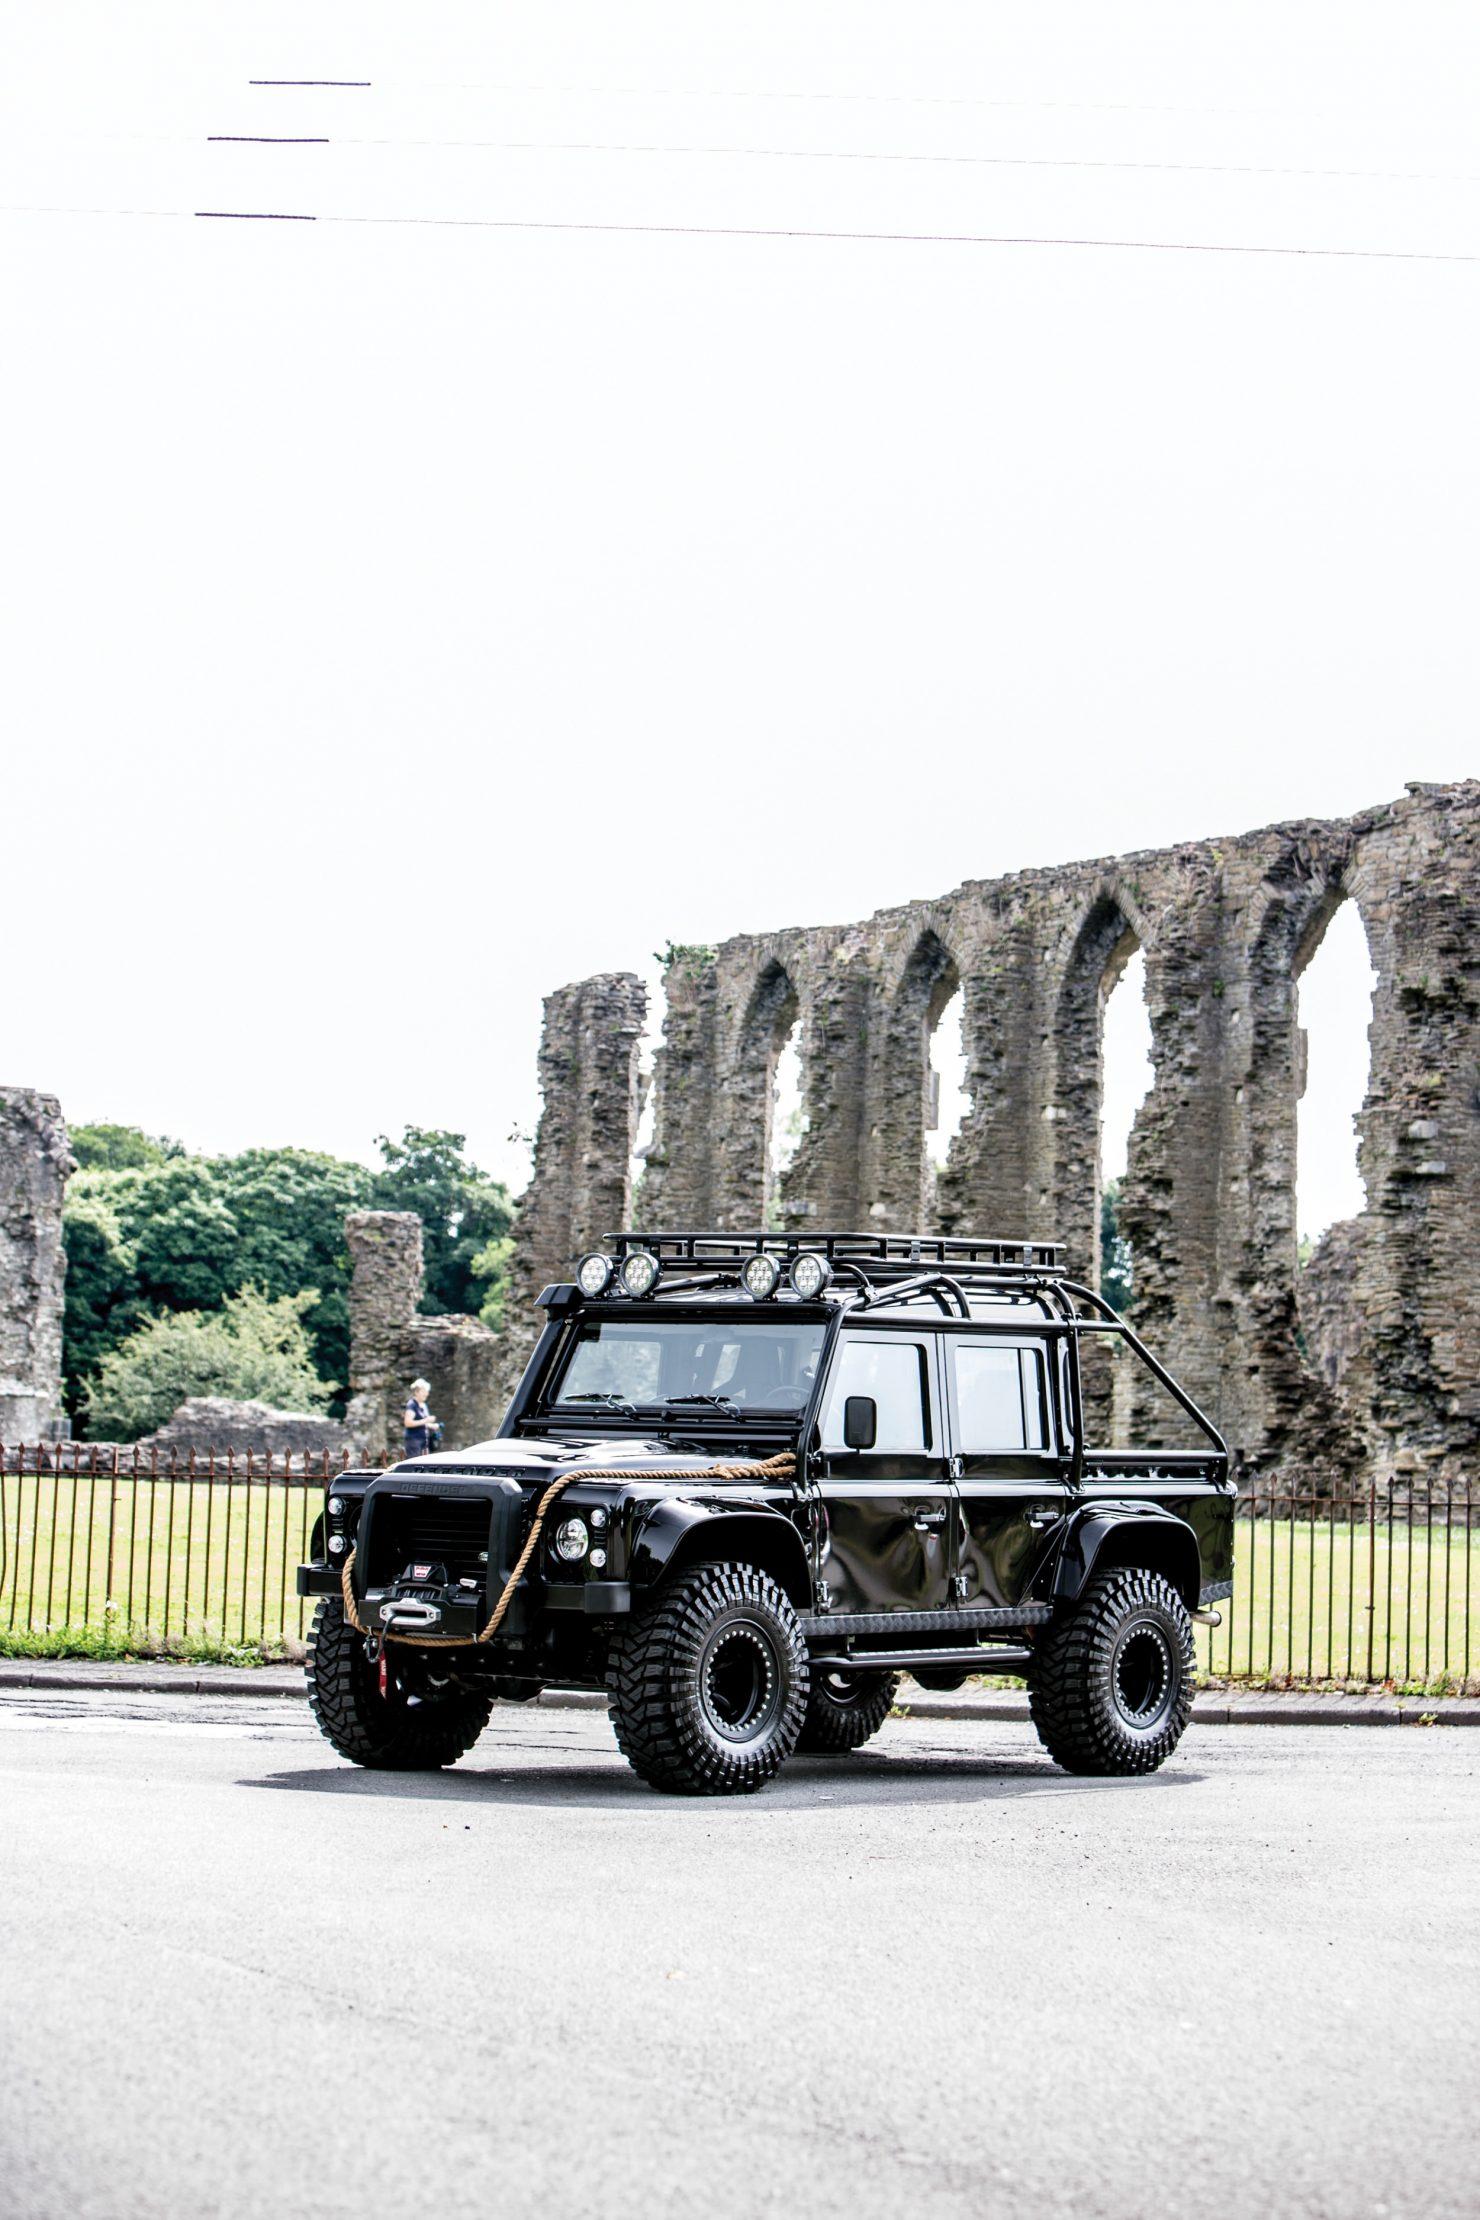 james bond spectre land rover defender svx 1 1480x2220 - Ex-James Bond Spectre - Land Rover Defender SVX